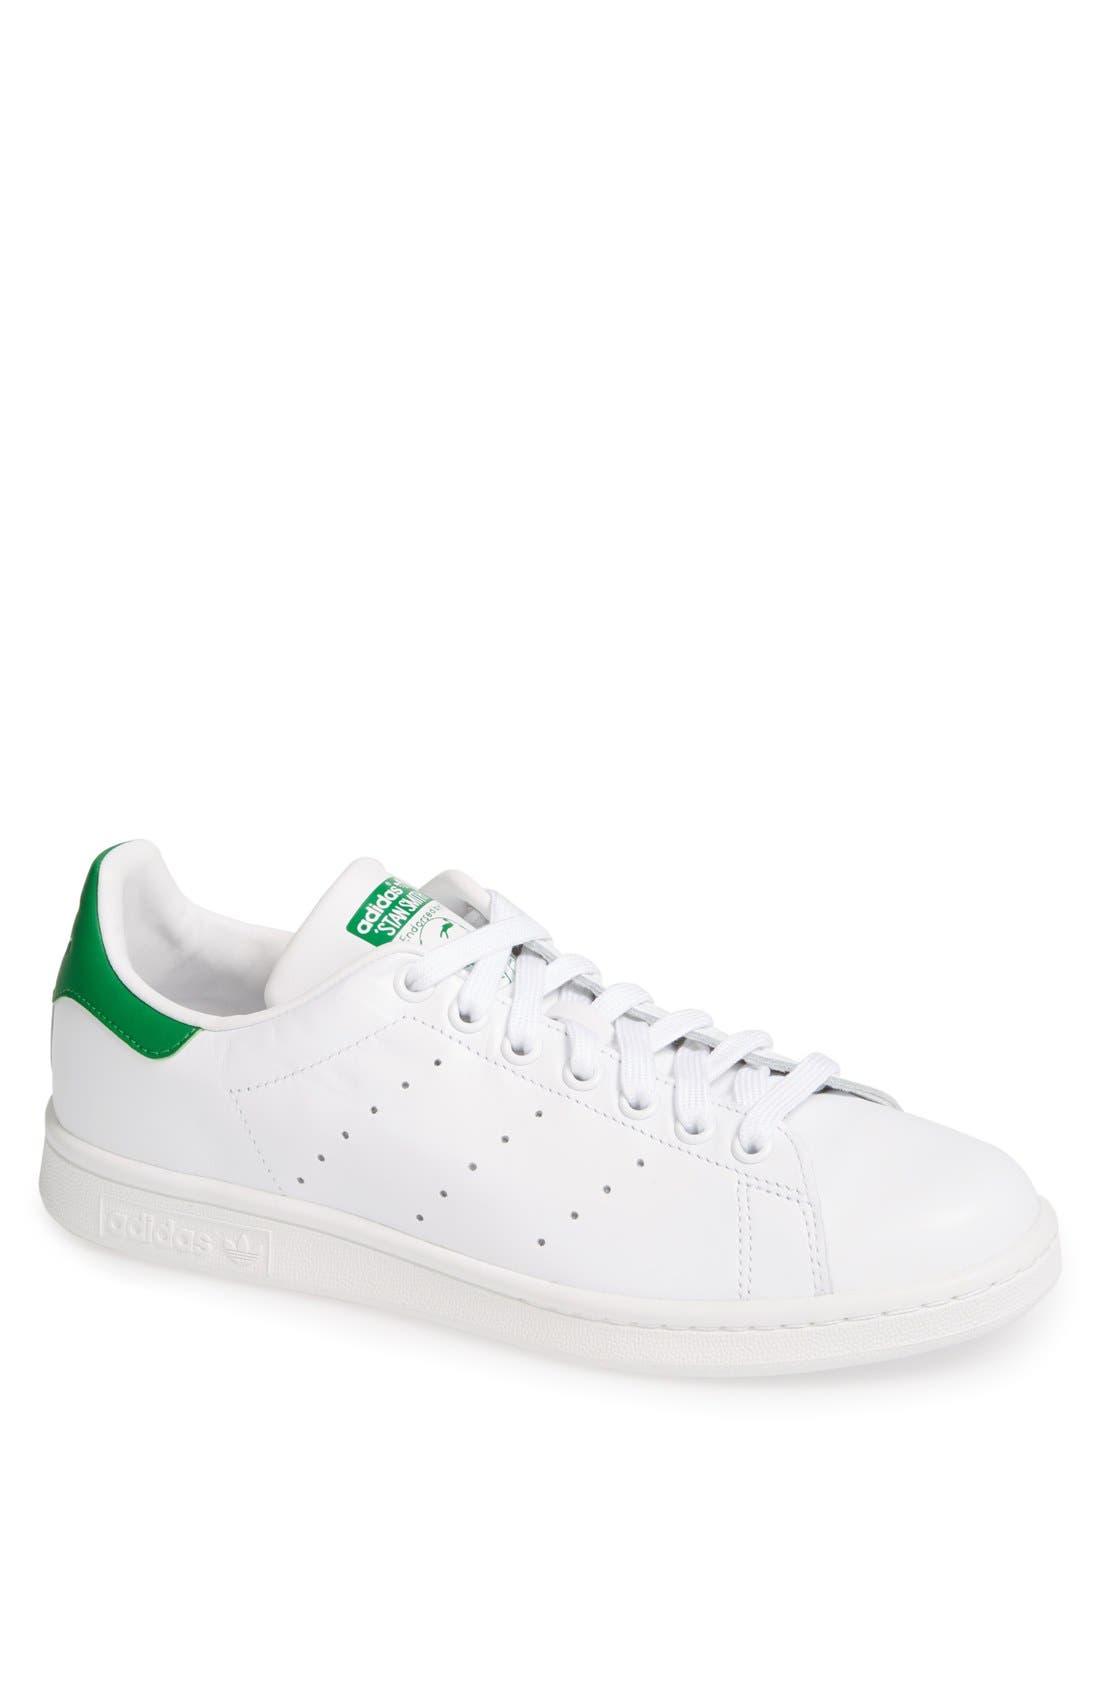 Main Image - adidas \u0027Stan Smith\u0027 Sneaker (Men)